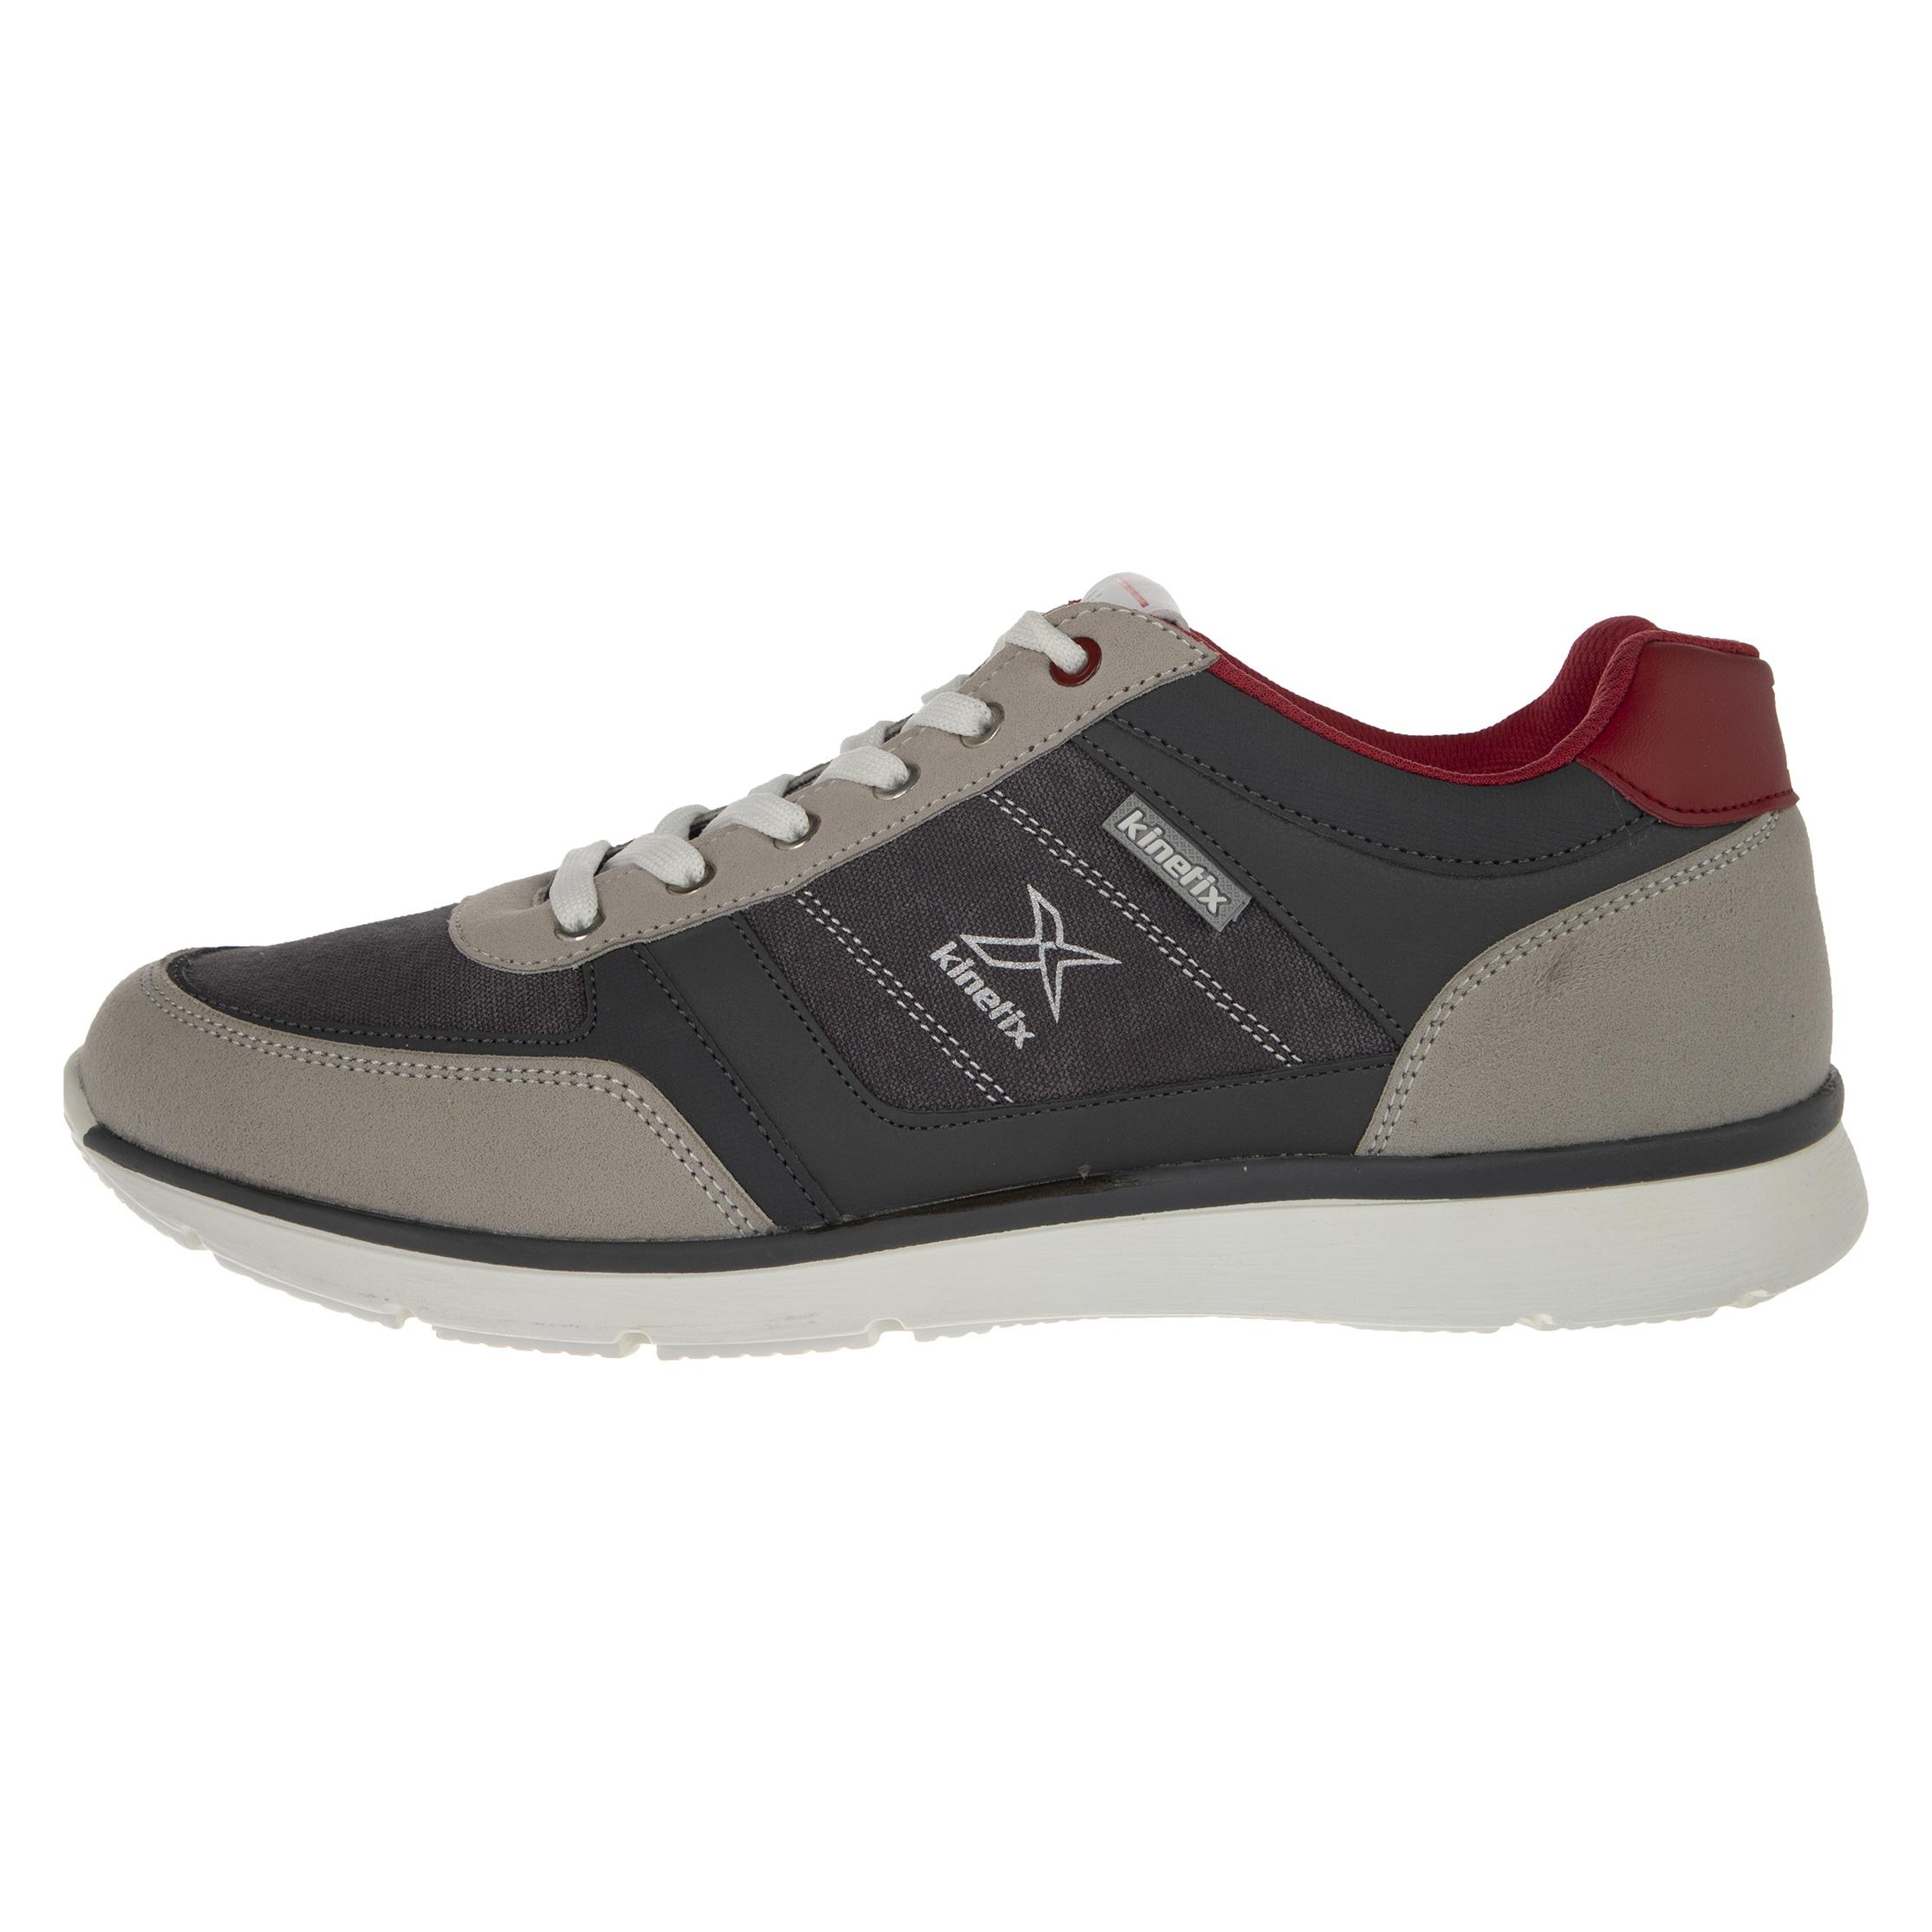 کفش روزمره مردانه کینتیکس مدل 100249963-109